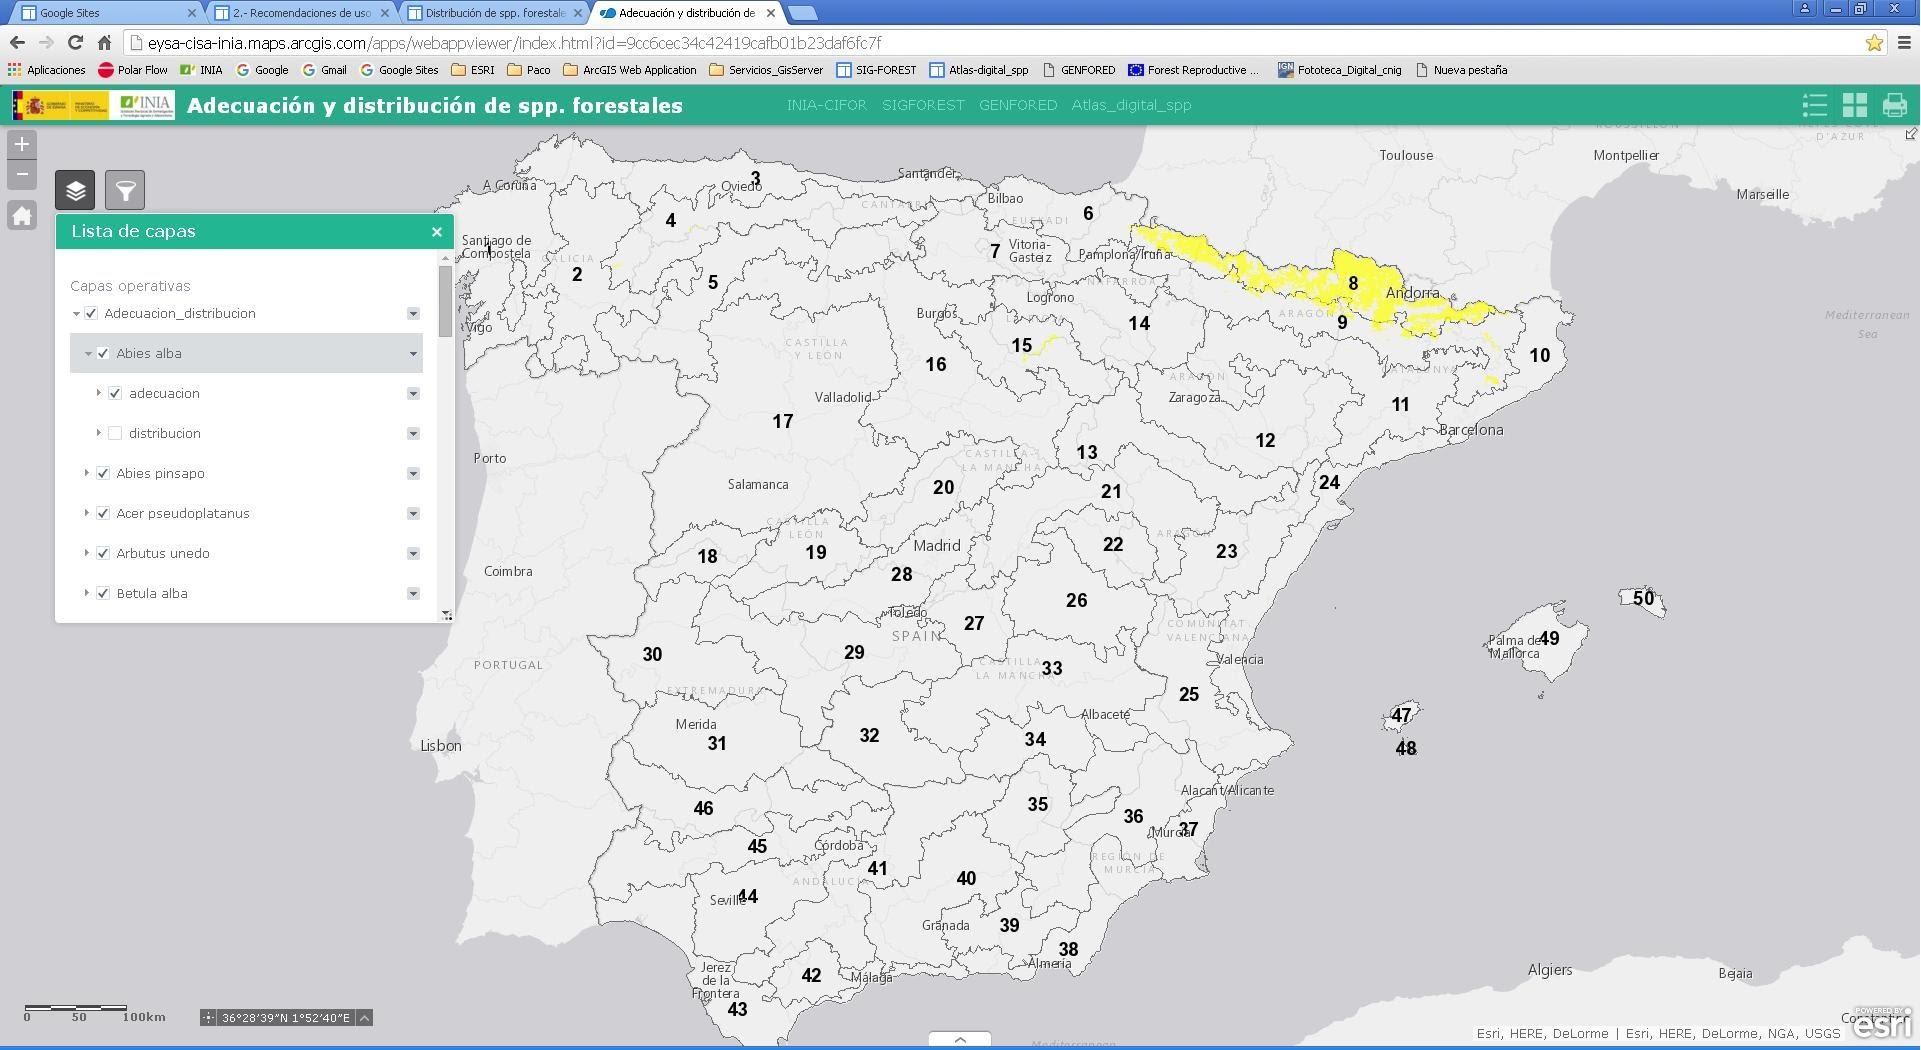 http://eysa-cisa-inia.maps.arcgis.com/apps/webappviewer/index.html?id=9cc6cec34c42419cafb01b23daf6fc7f